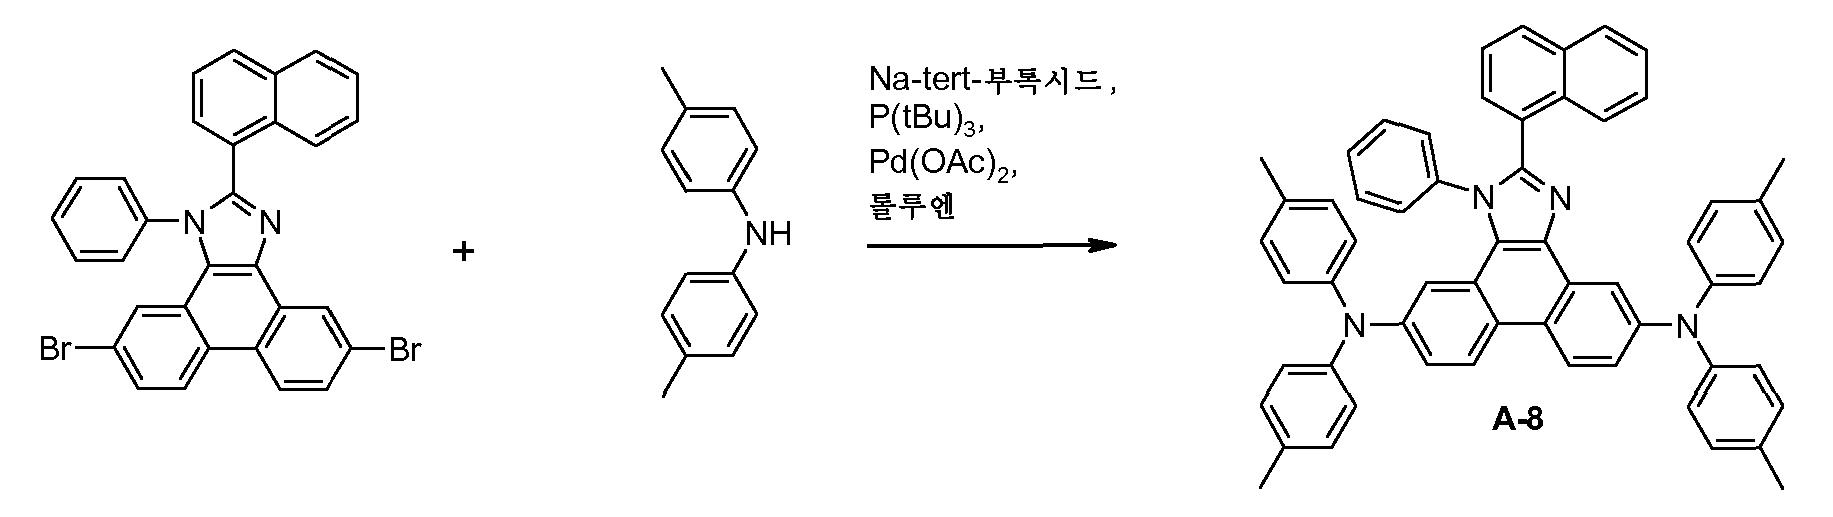 Figure 112012004234516-pct00073